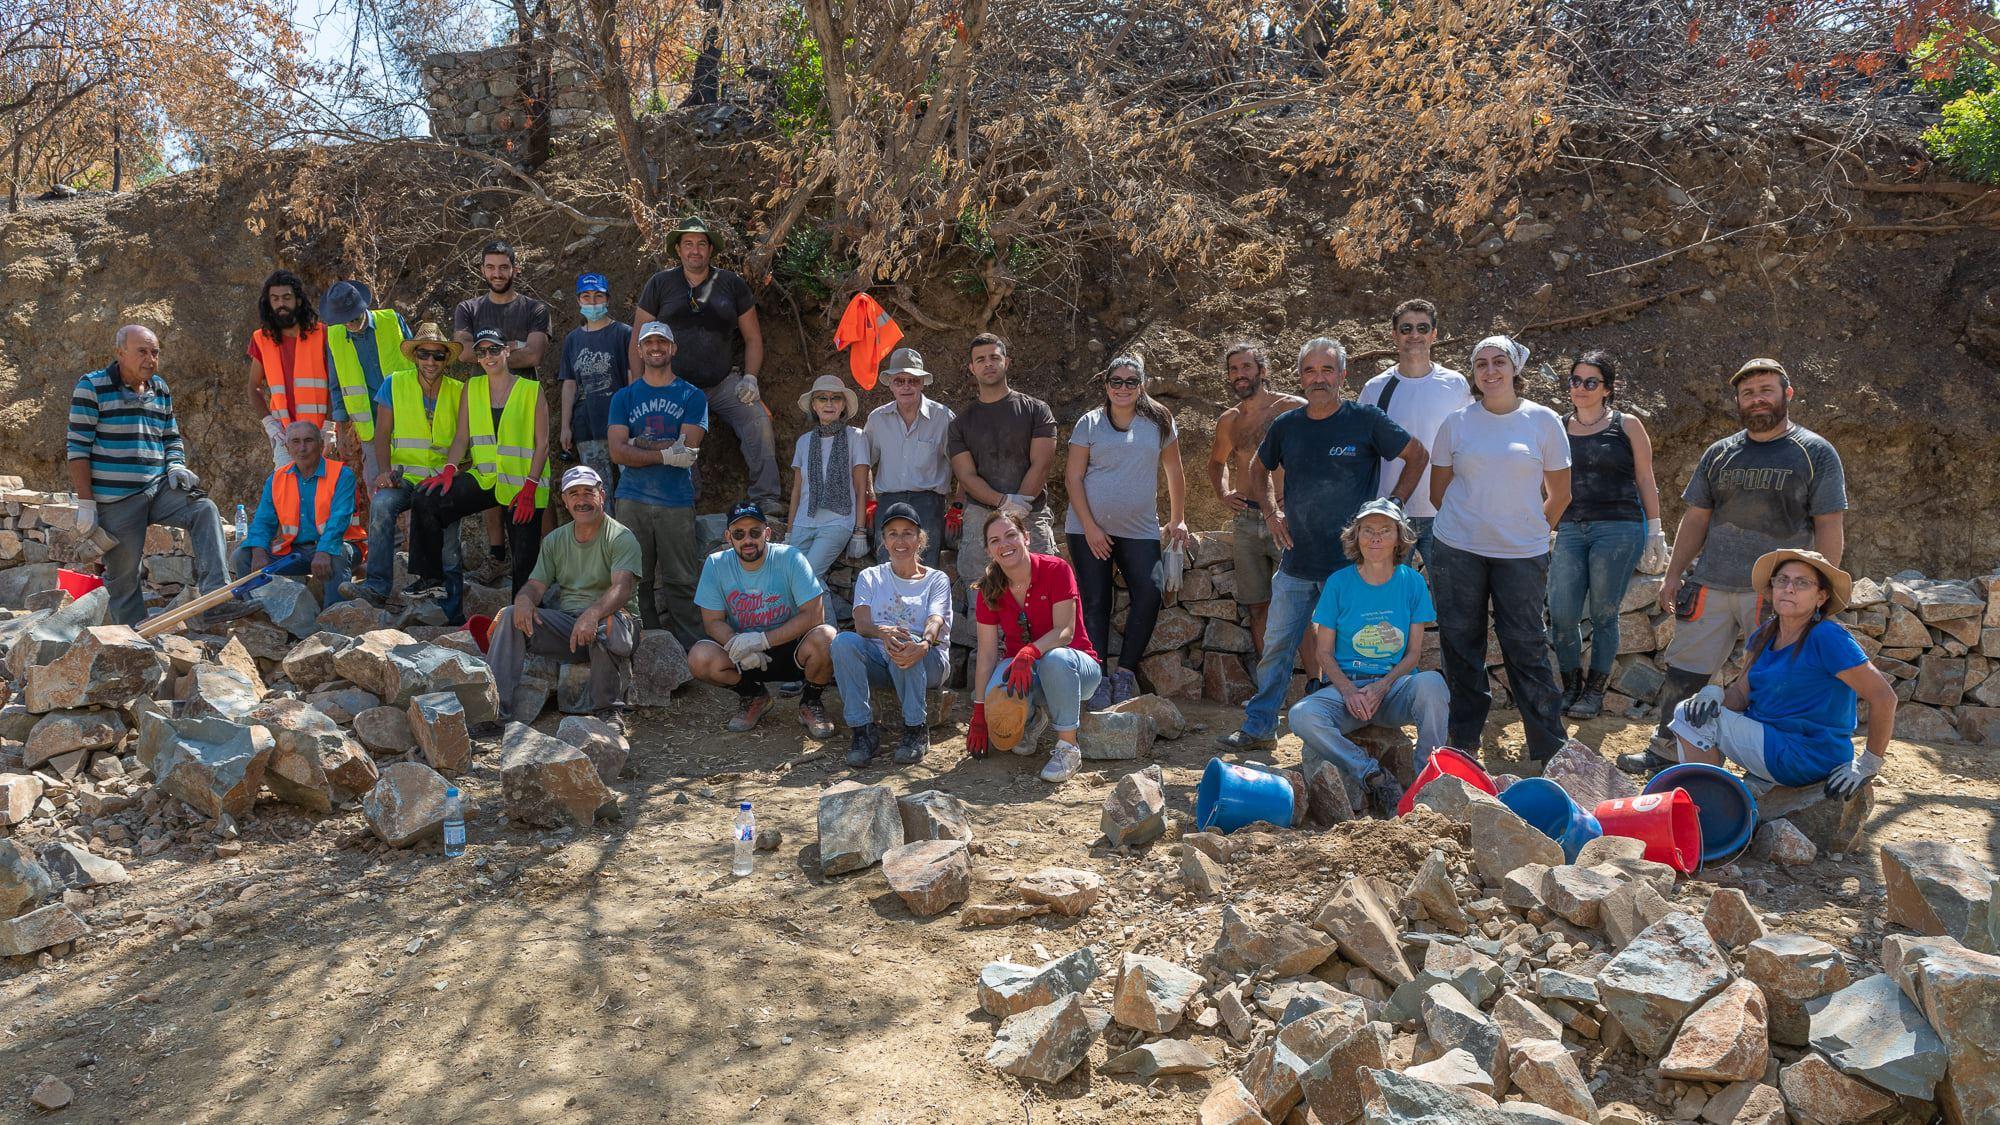 Oλοκληρώθηκε το πρώτο από 12 εργαστήρια εκμάθησης της τεχνικής κατασκευής ξηρολιθικής δομής όπου συμμετείχαν τα πυρόπληκτα χωριά Λάρνακας – Λεμεσού (φώτο)